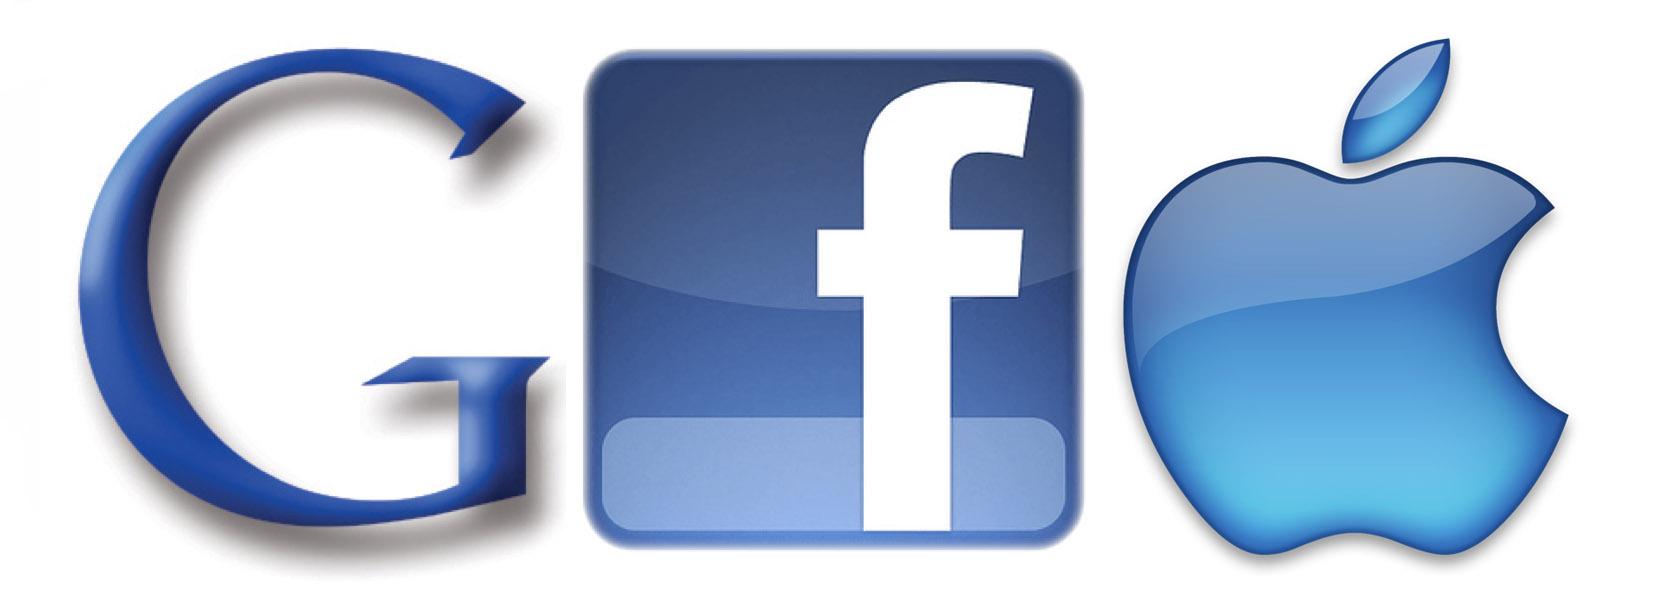 Google превзошла Apple и Facebook